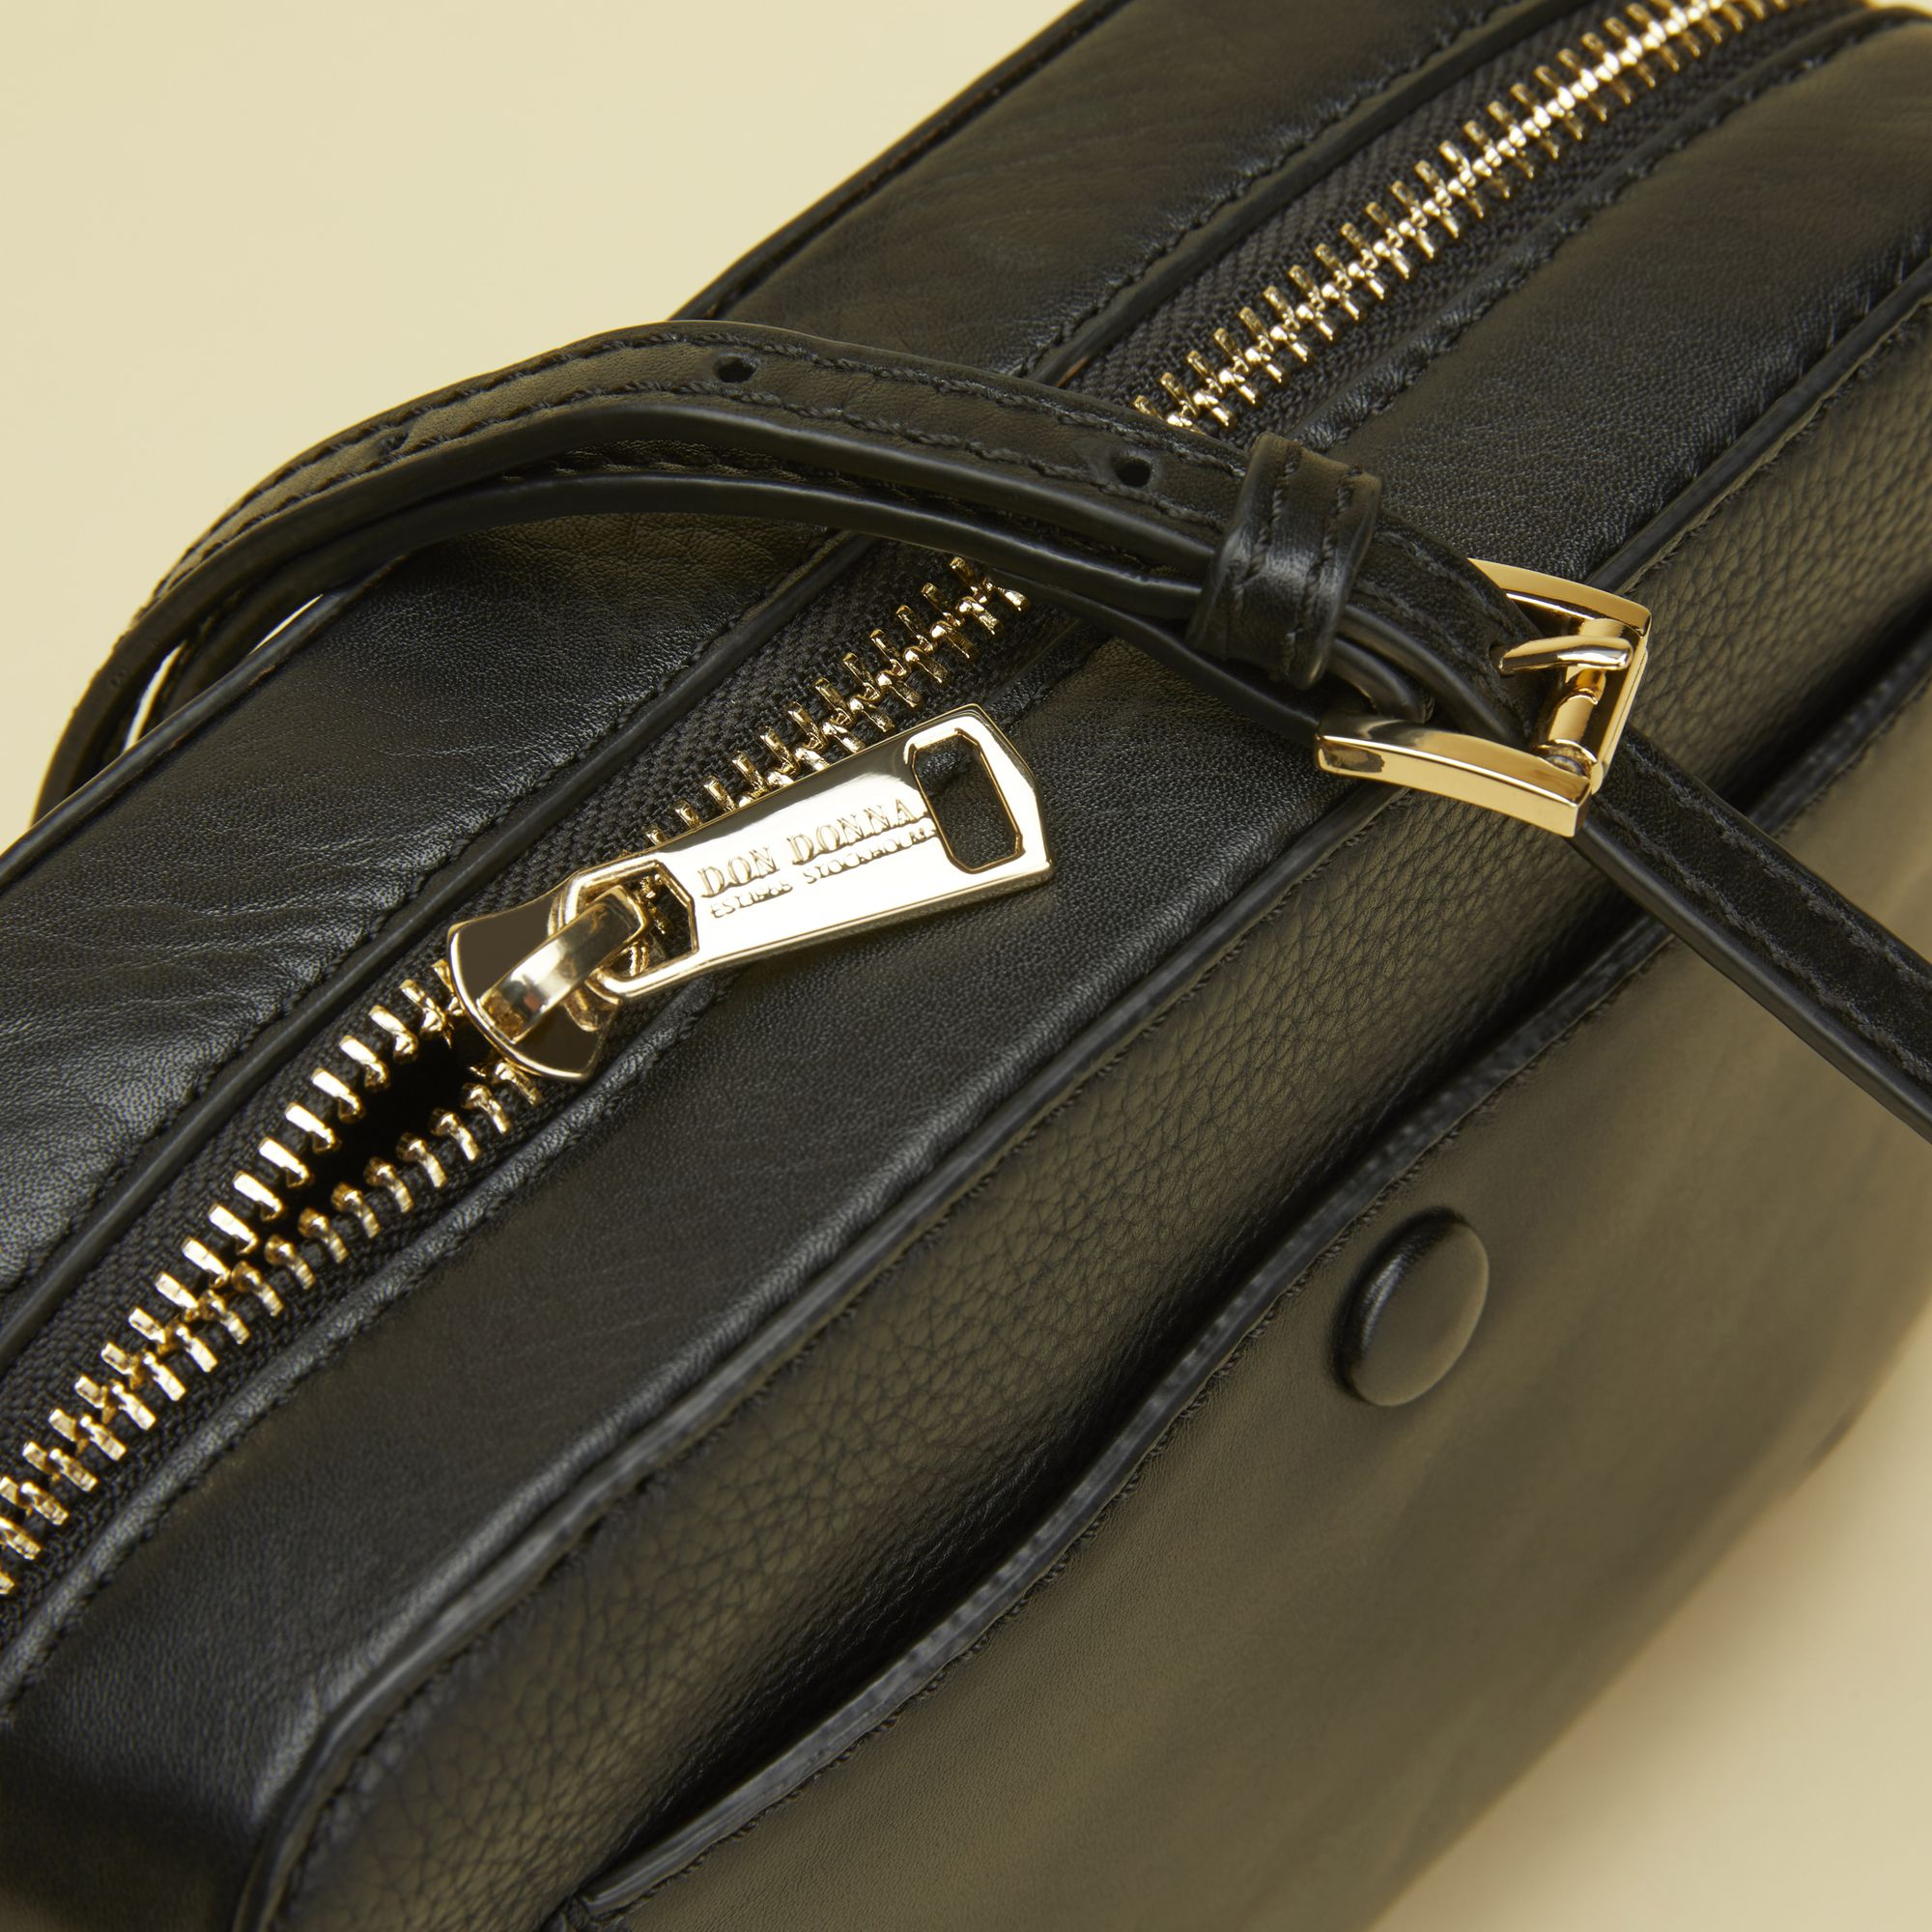 Kjøp Don Donna Don Donna Belinda Camerabag väska i skinn her  5fd61b246b2e9